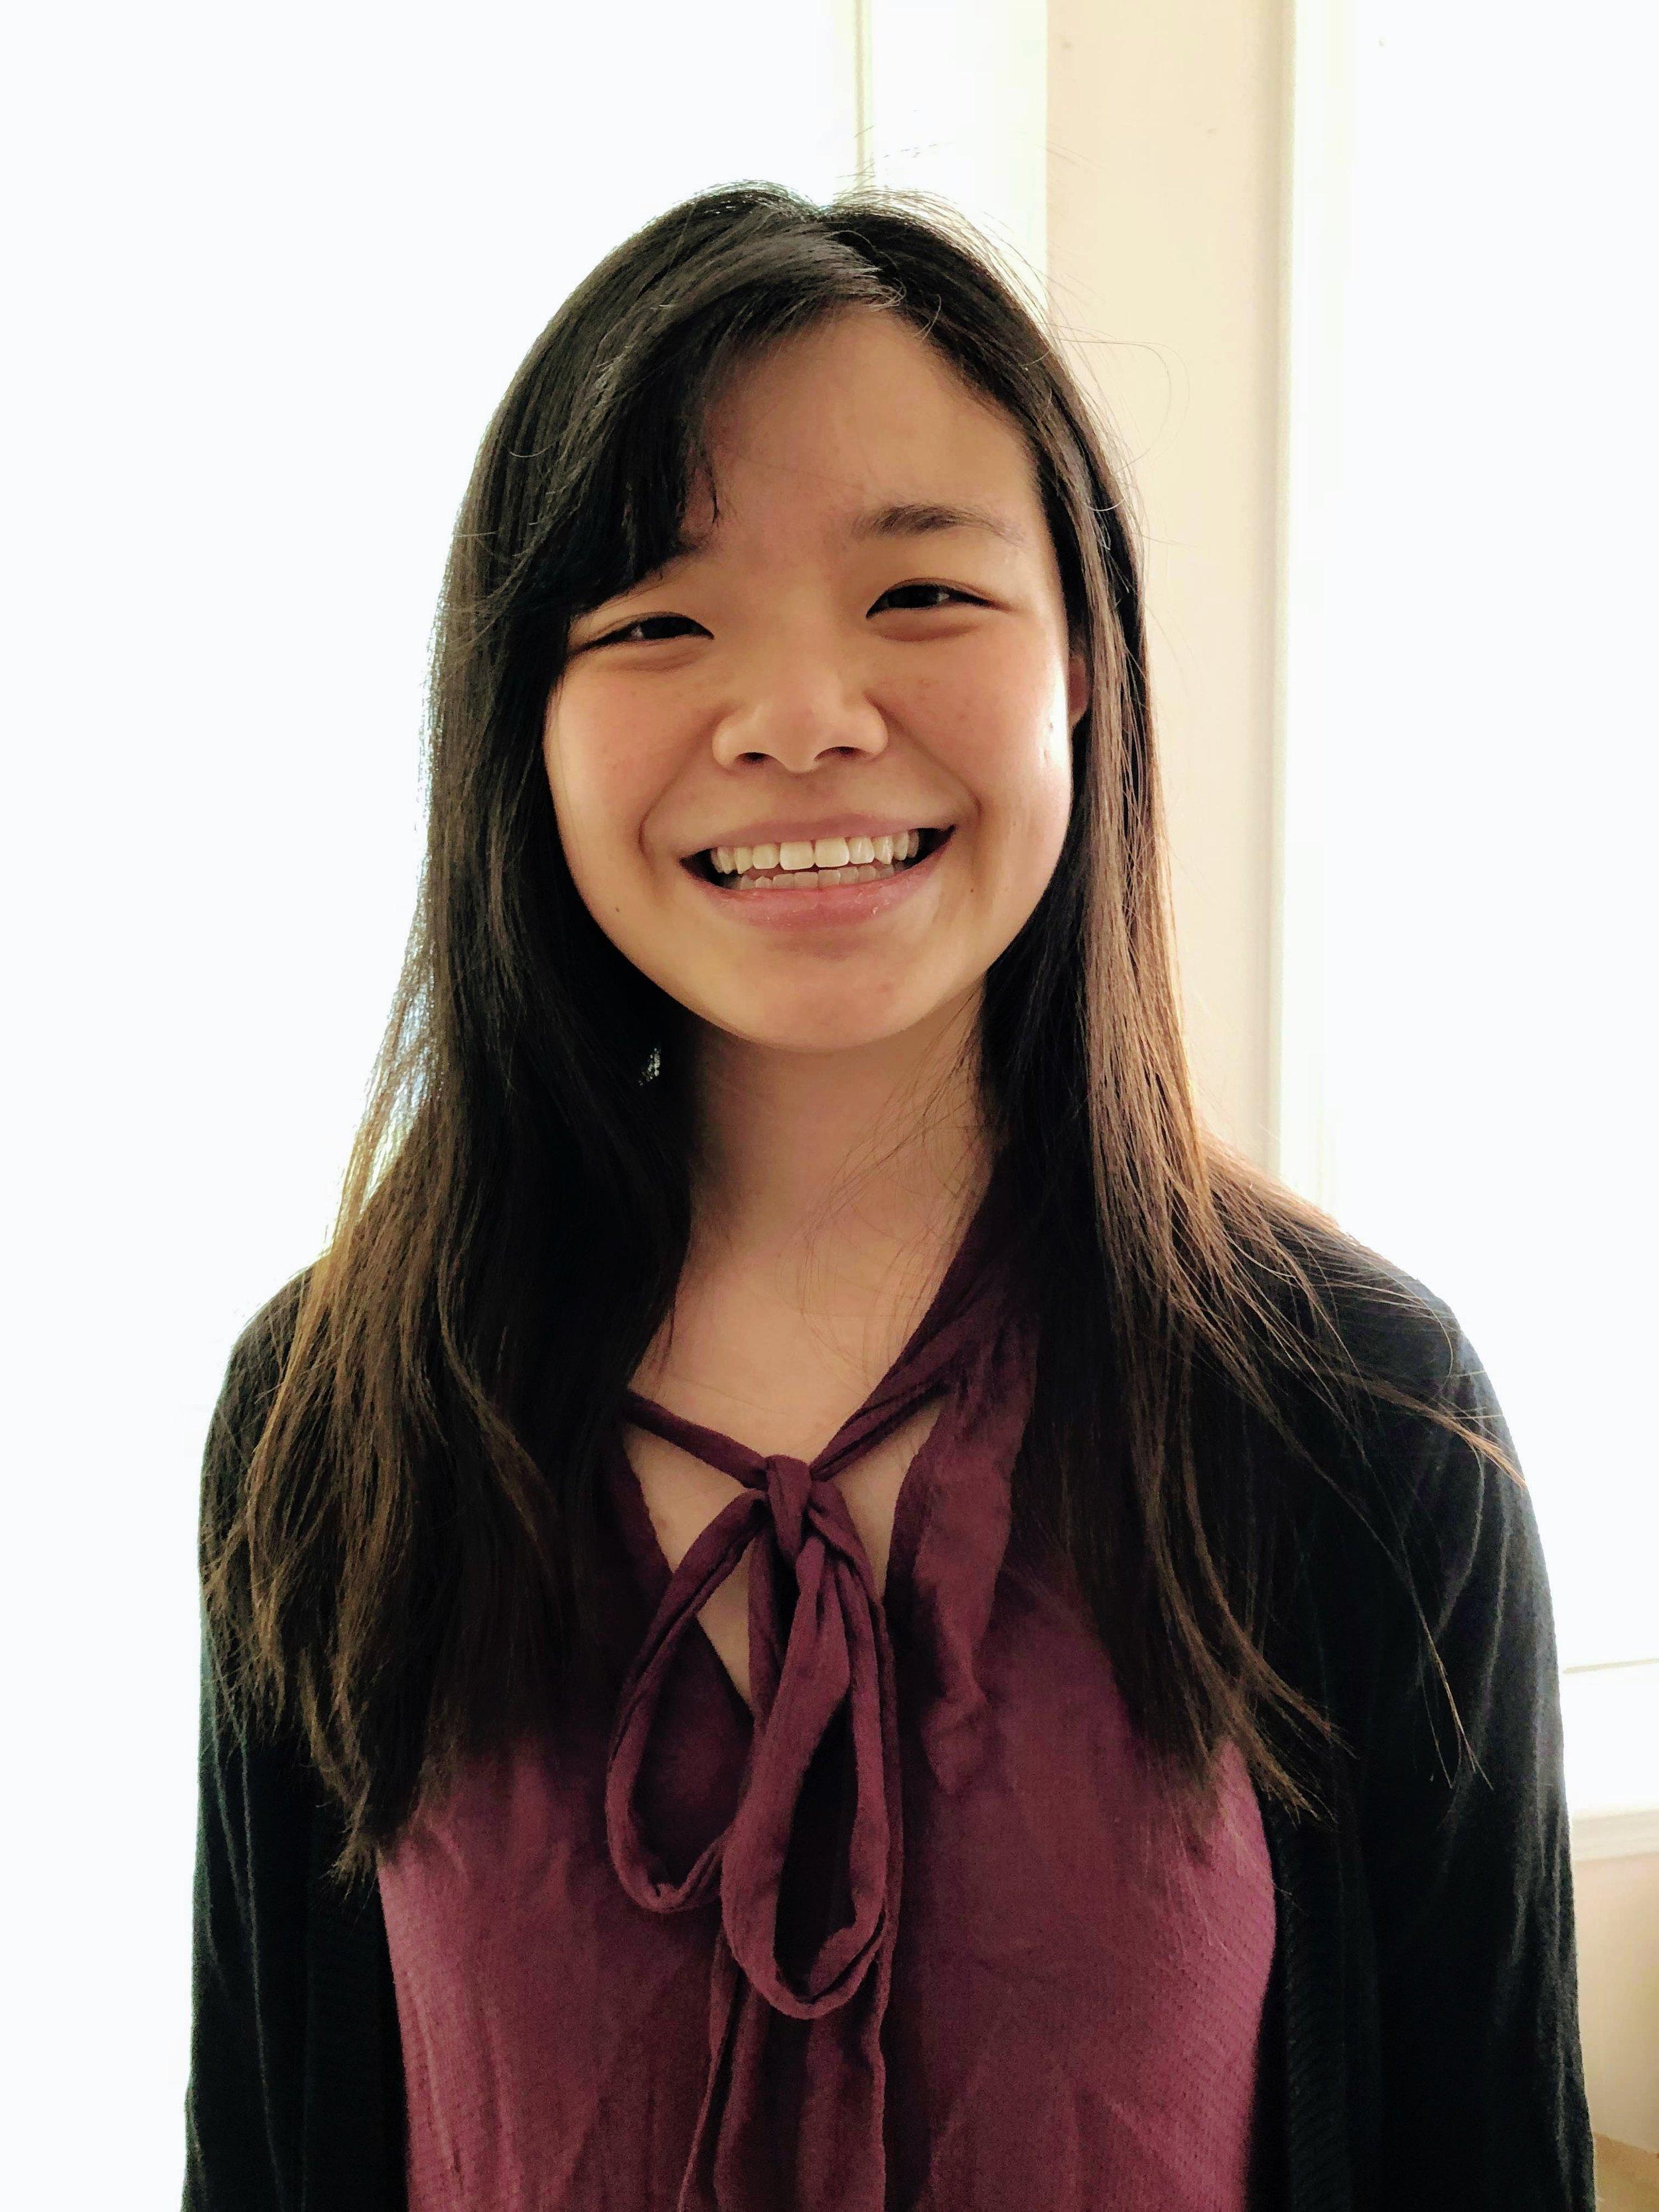 Julianne is a senior studying Specialized Biochemistry